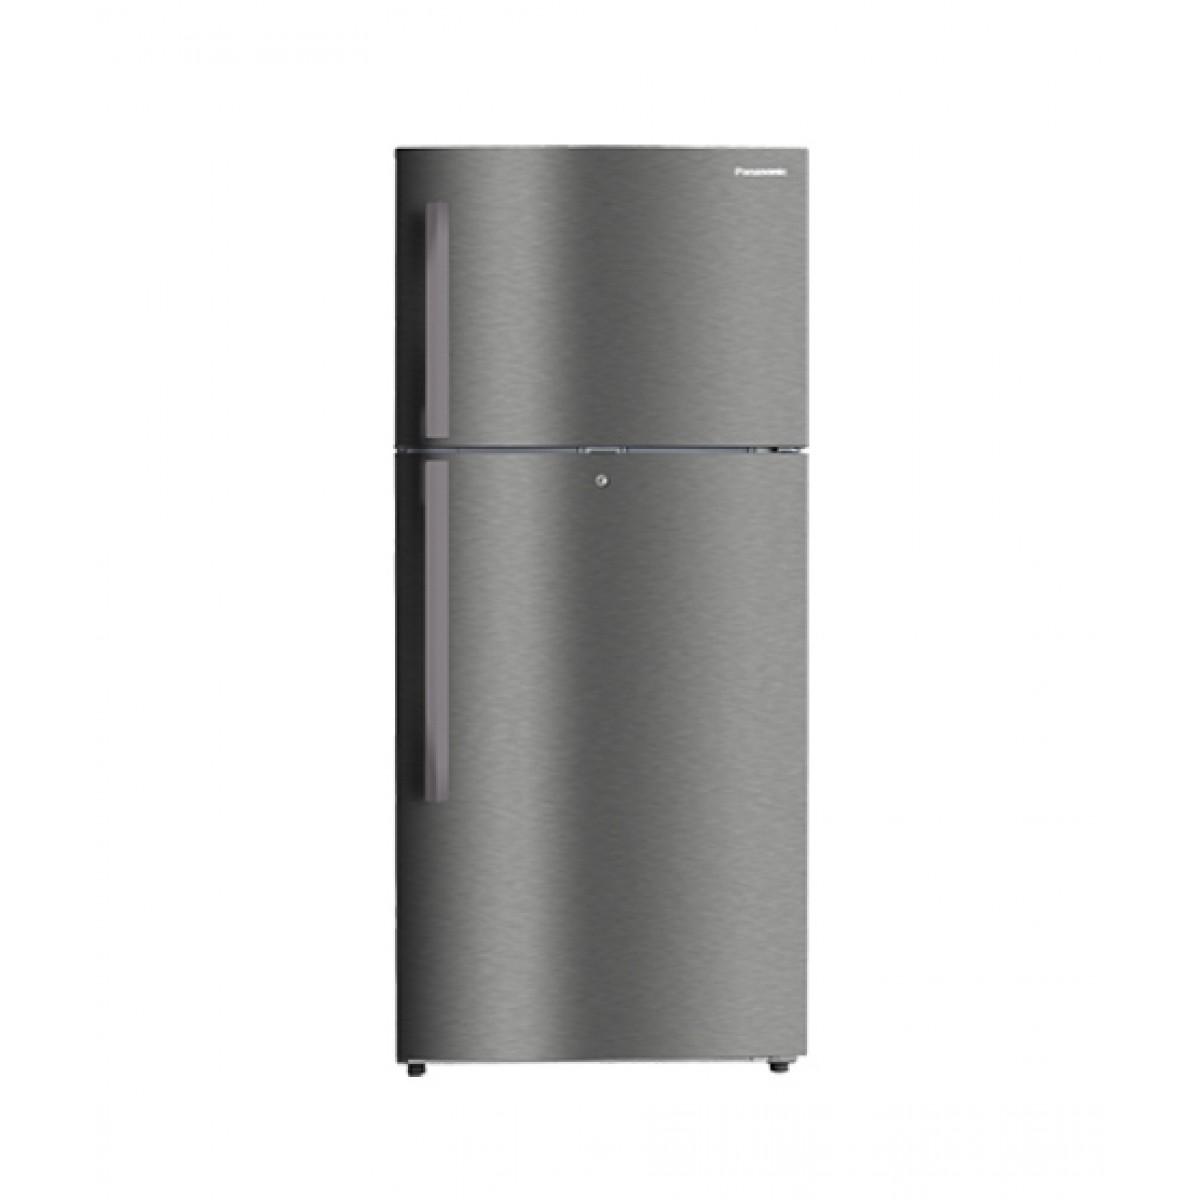 Panasonic Top Freezer Refrigerator 490L (NR-BC49MS)